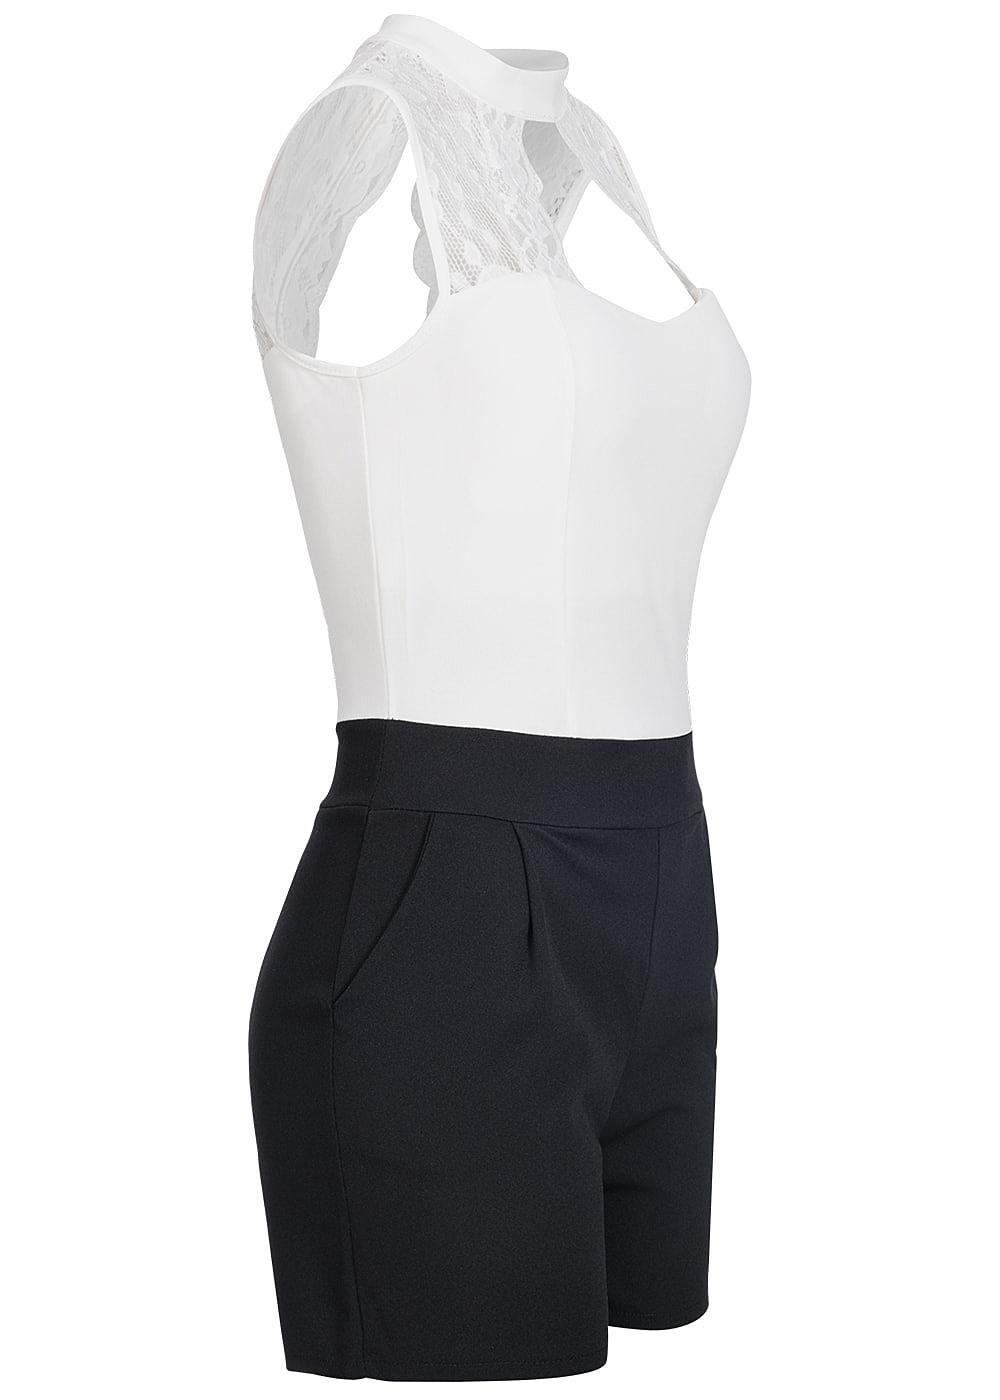 styleboom fashion jumpsuit spitze brustpads weiss schwarz 77onlineshop. Black Bedroom Furniture Sets. Home Design Ideas